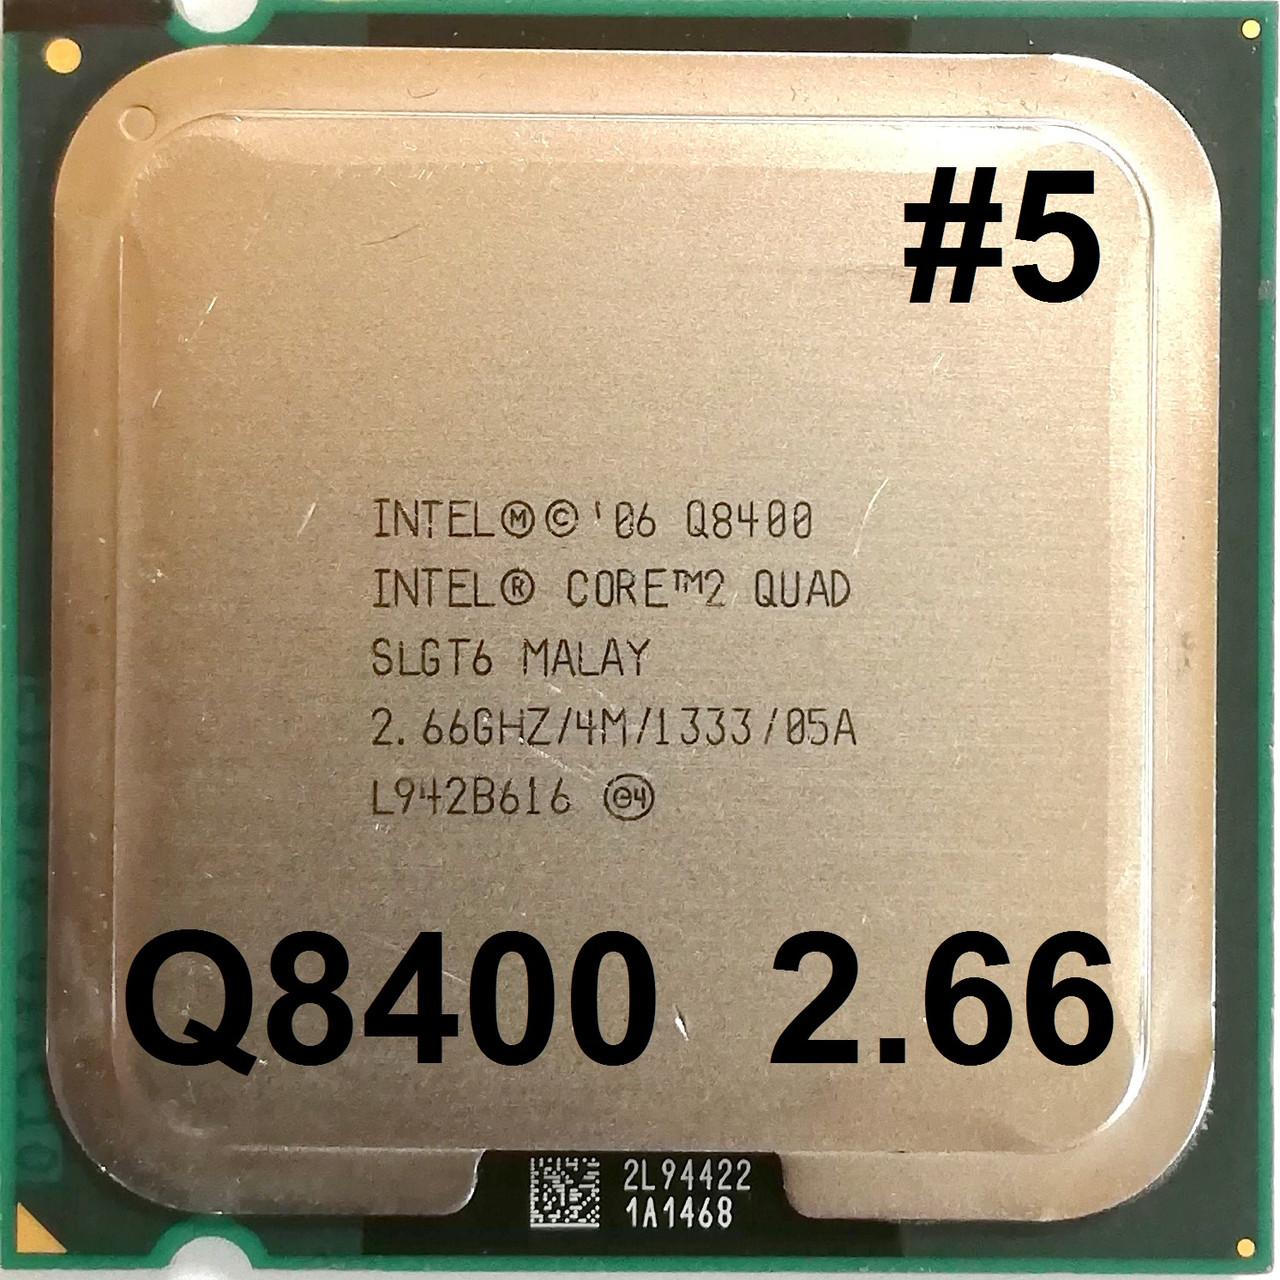 Процессор ЛОТ#5 Intel Core 2 Quad Q8400 R0 SLGT6 2.66GHz 4M Cache 1333 MHz FSB Soket 775 Б/У